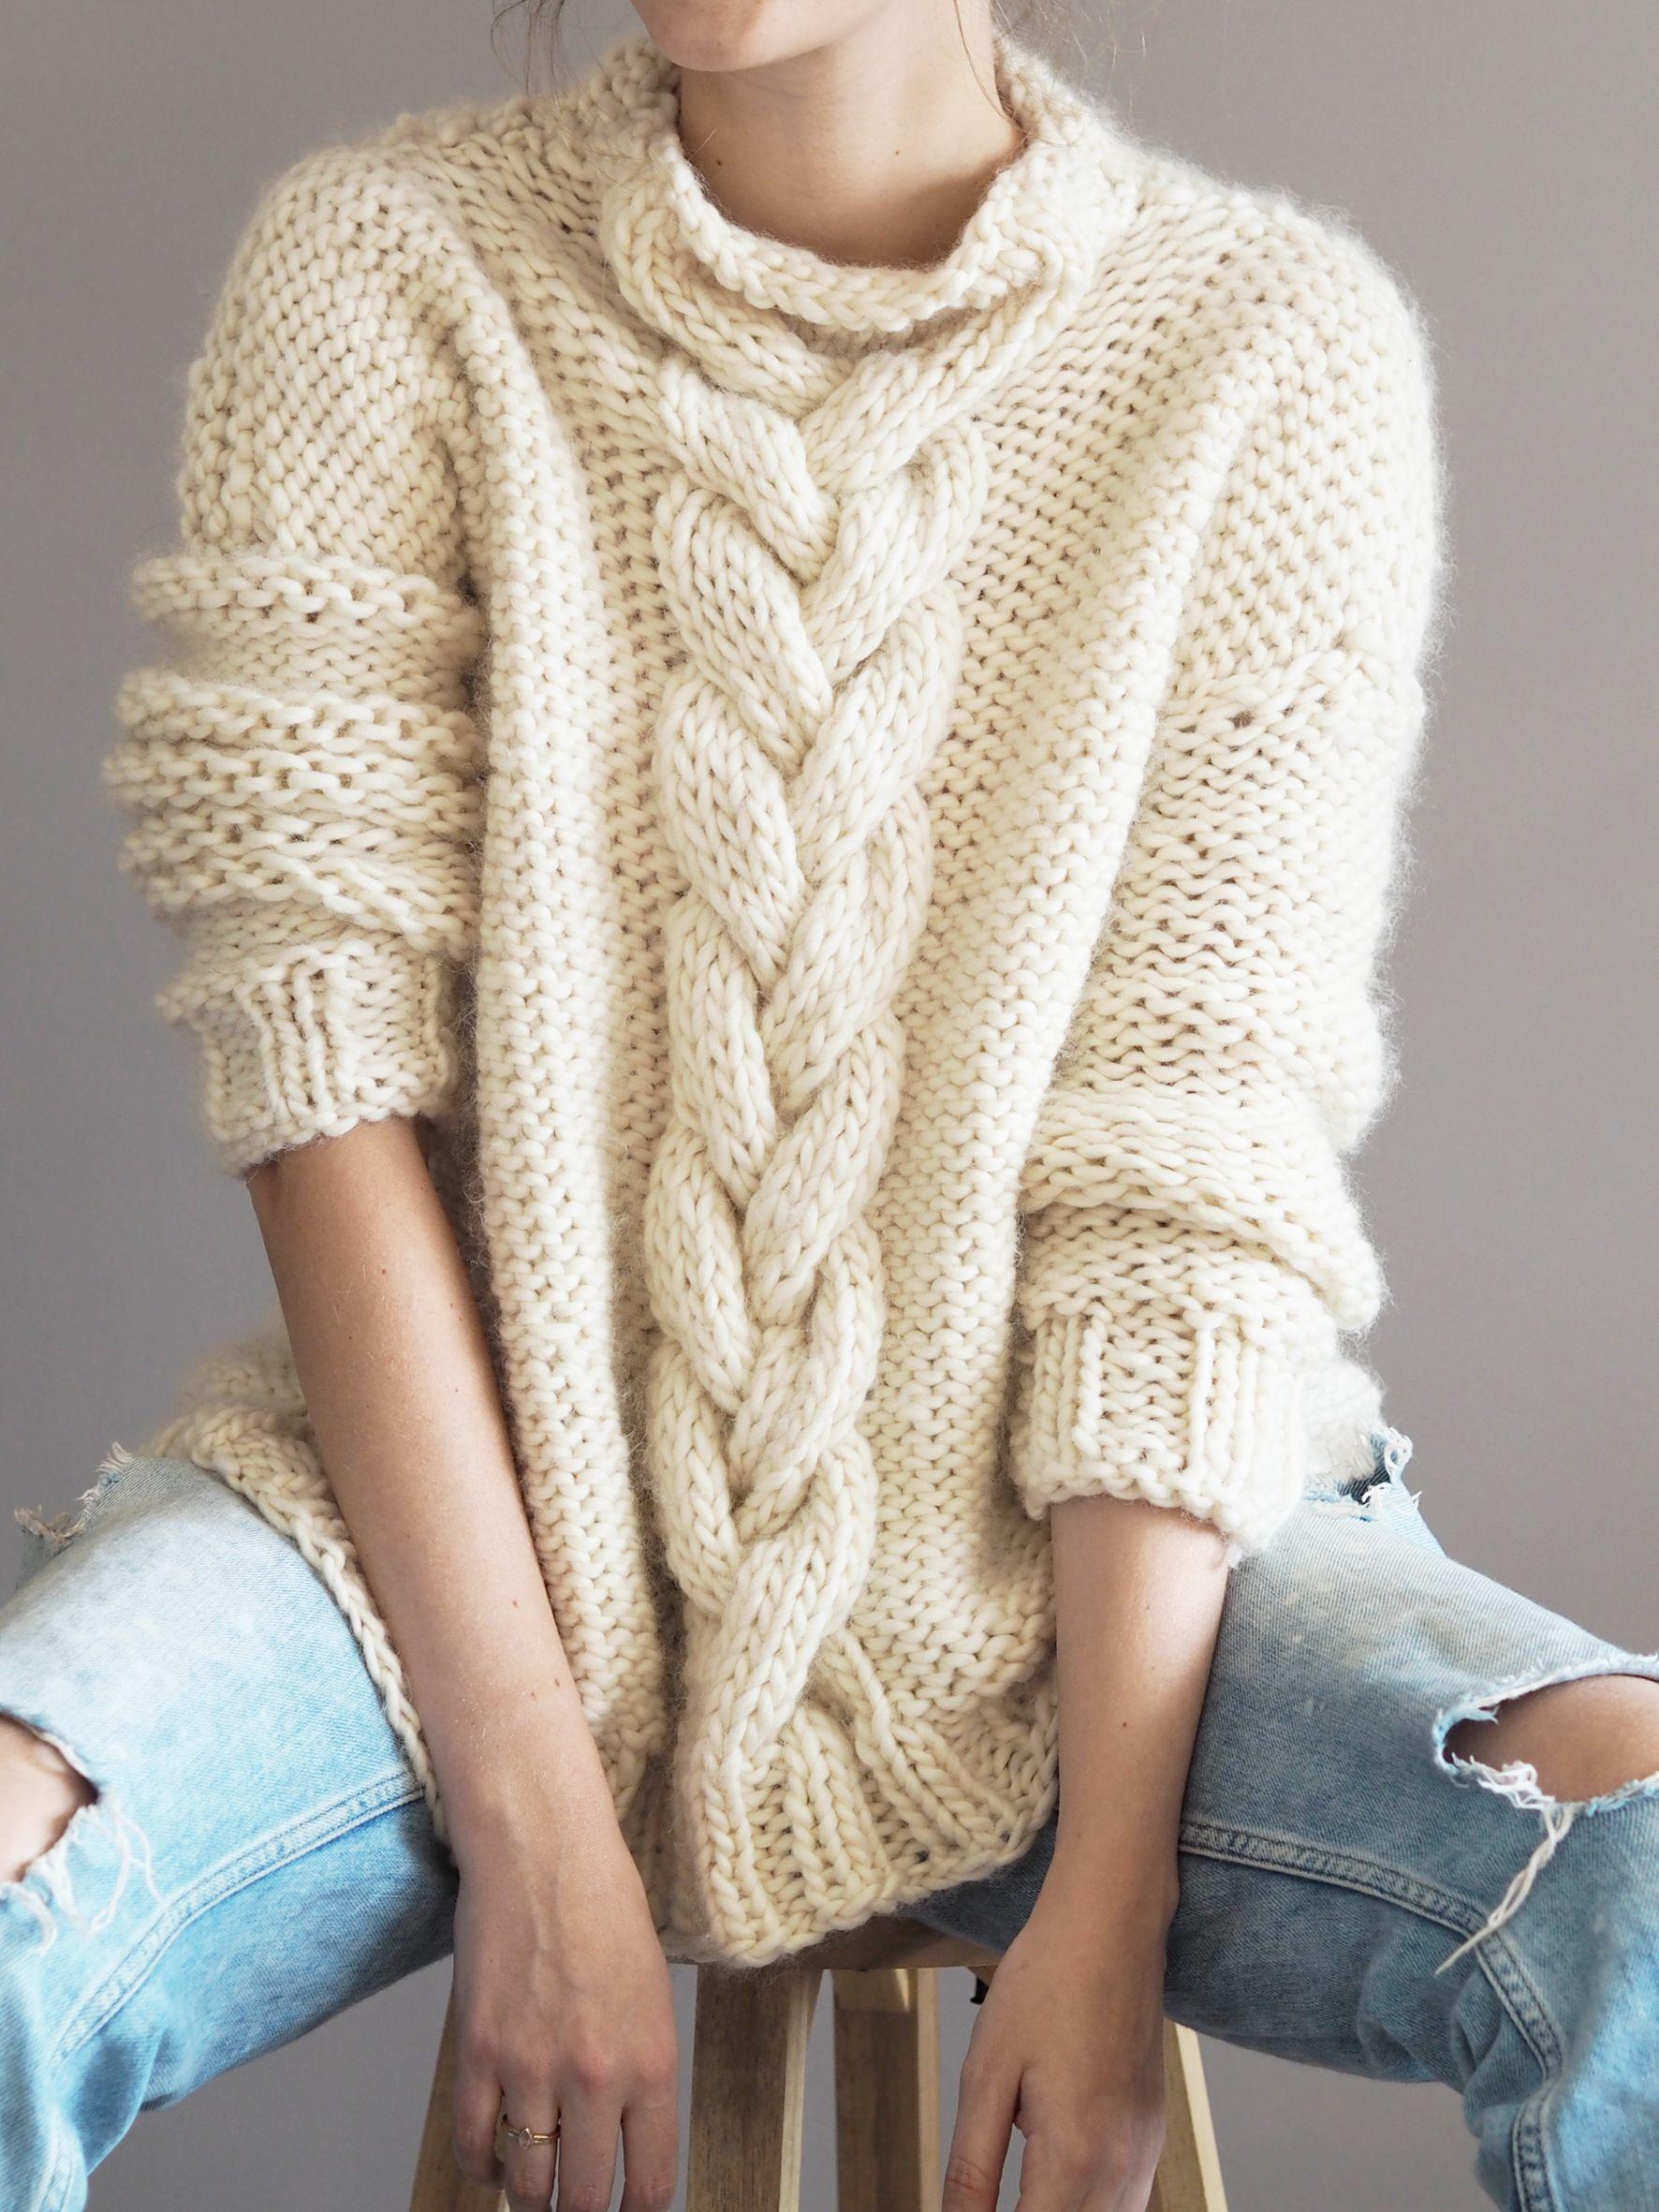 Knit Kit - Cable Knit Jumper   Knitting   Knitting, Knitting ...